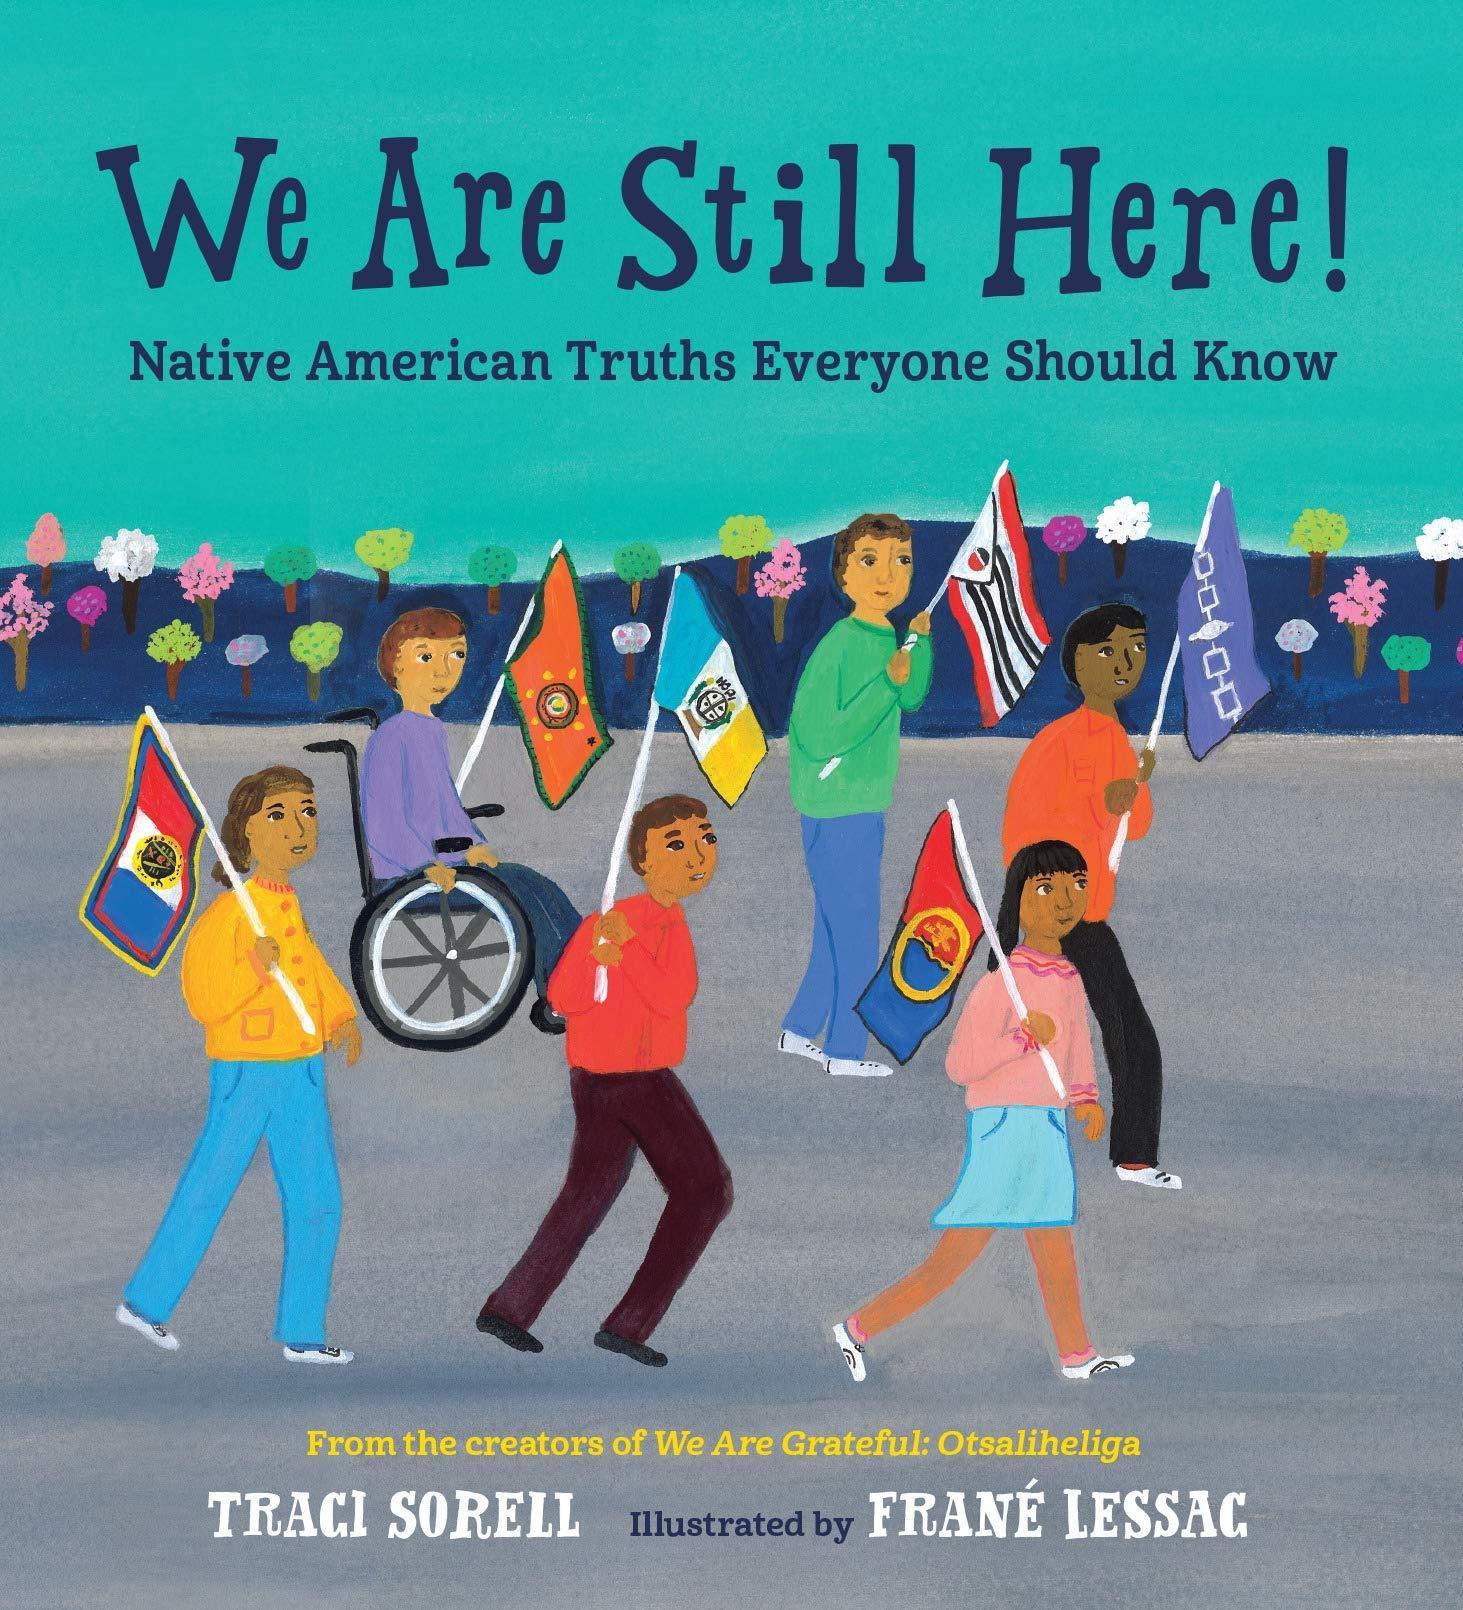 Amazon.com: We Are Still Here!: Native American Truths Everyone Should  Know: 9781623541927: Sorell, Traci, Lessac, Frane: Books